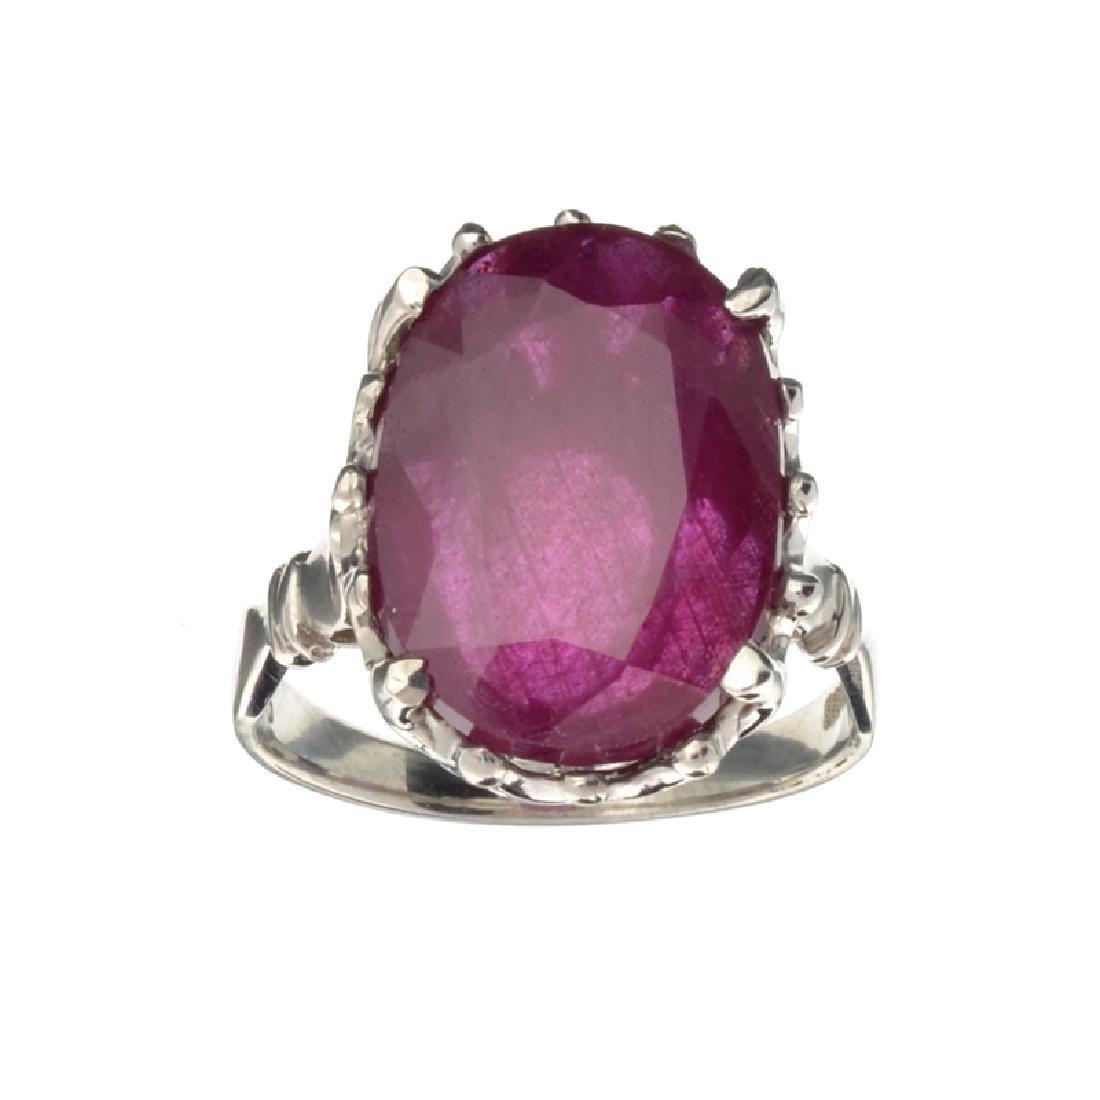 APP: 3.8k Fine Jewelry Designer Sebastian 12.81CT Oval